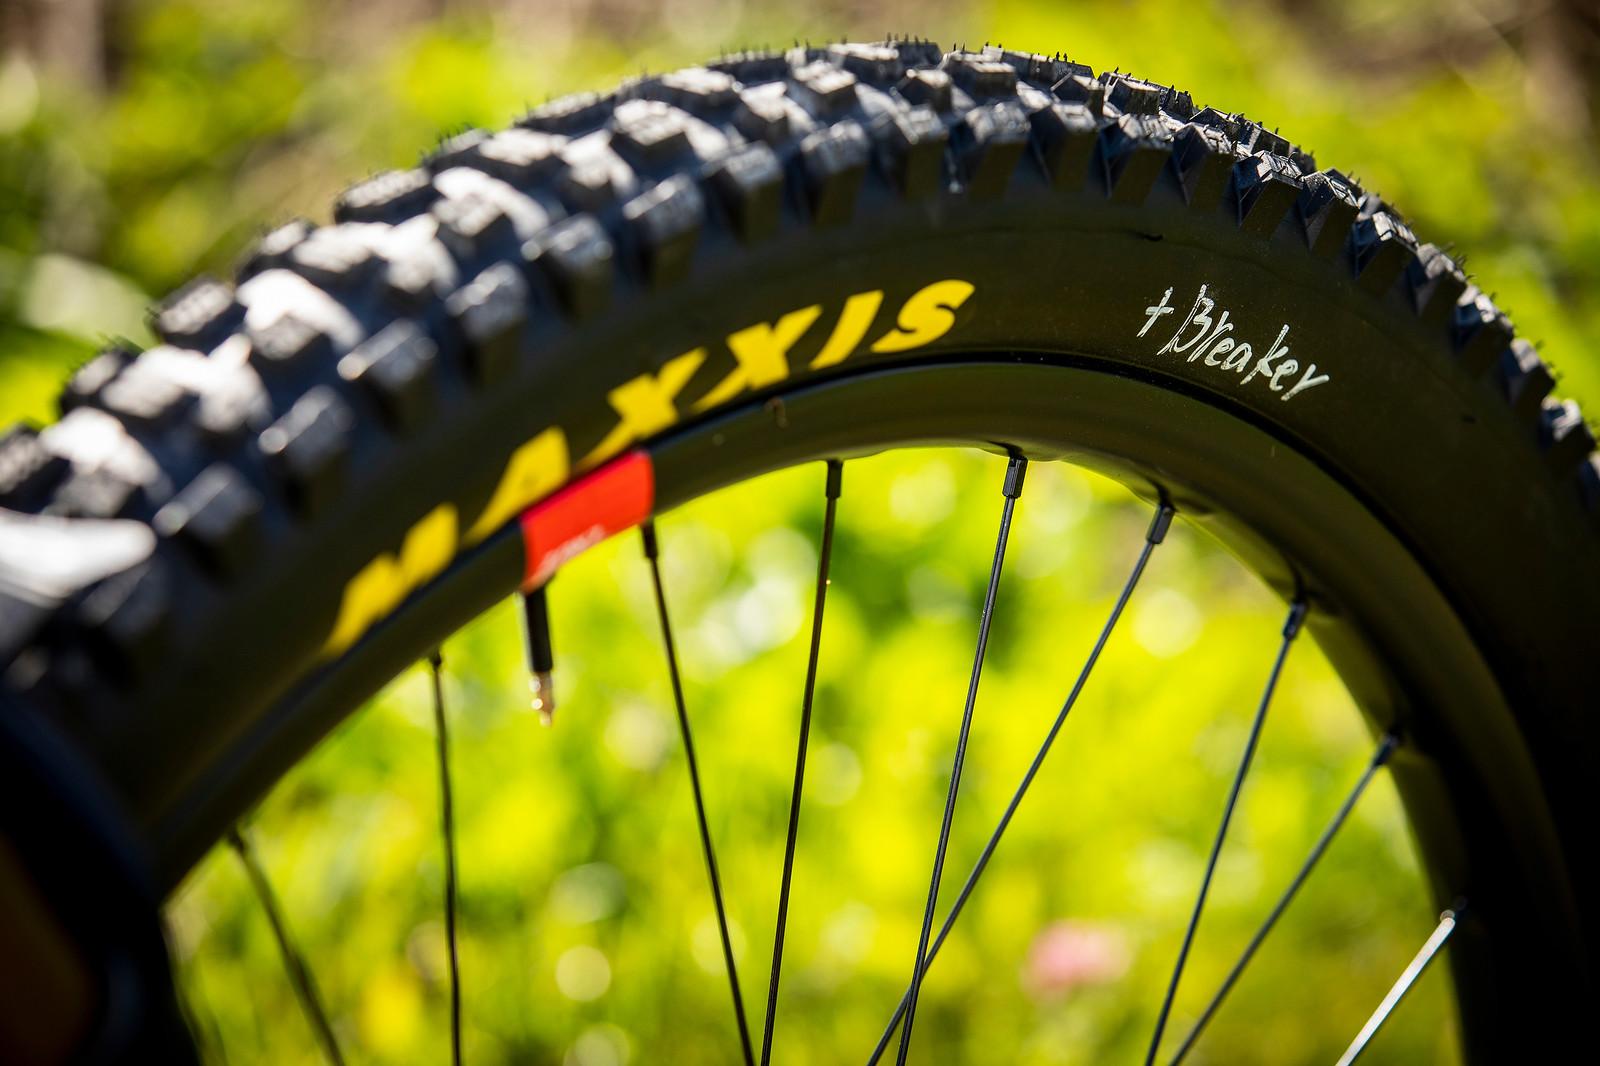 Maxxis Plus Breaker - WORLD CHAMPS BIKE - Greg Minnaar's Santa Cruz V10 - Mountain Biking Pictures - Vital MTB